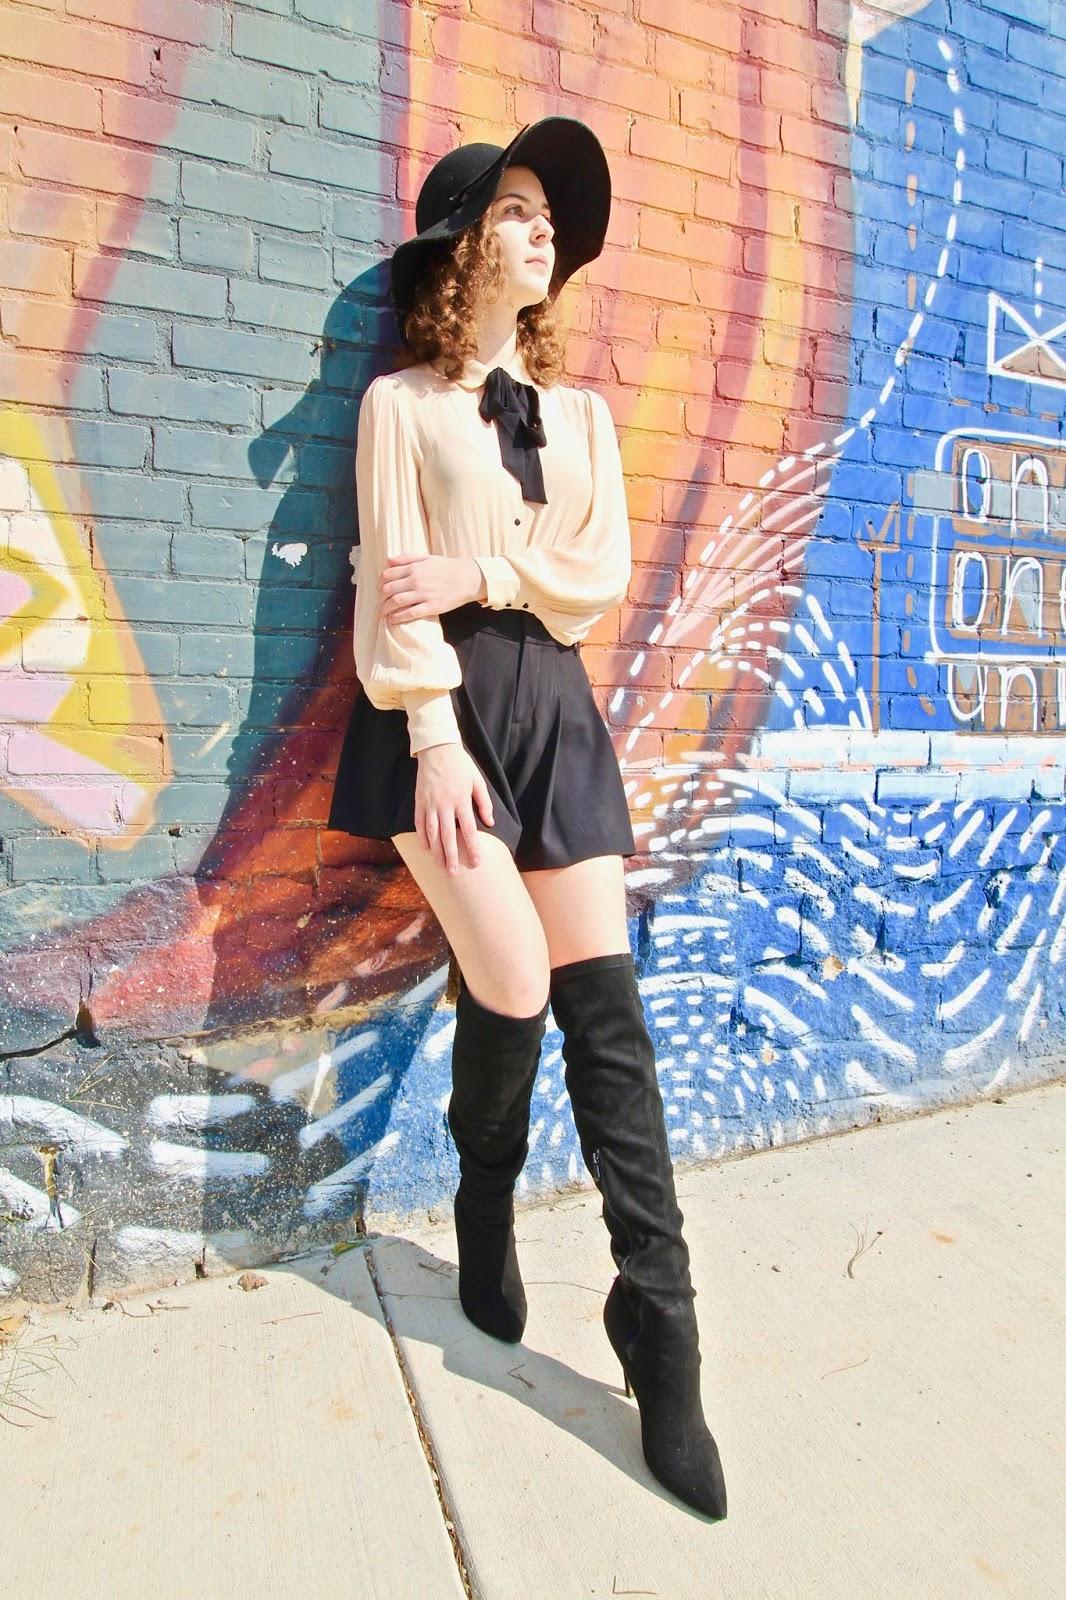 98a051548a Outfit details: Forever 21 blouse, Alice + Olivia shorts, Unique Vintage  hat, Laurel Black Over the Knee Heeled Boots